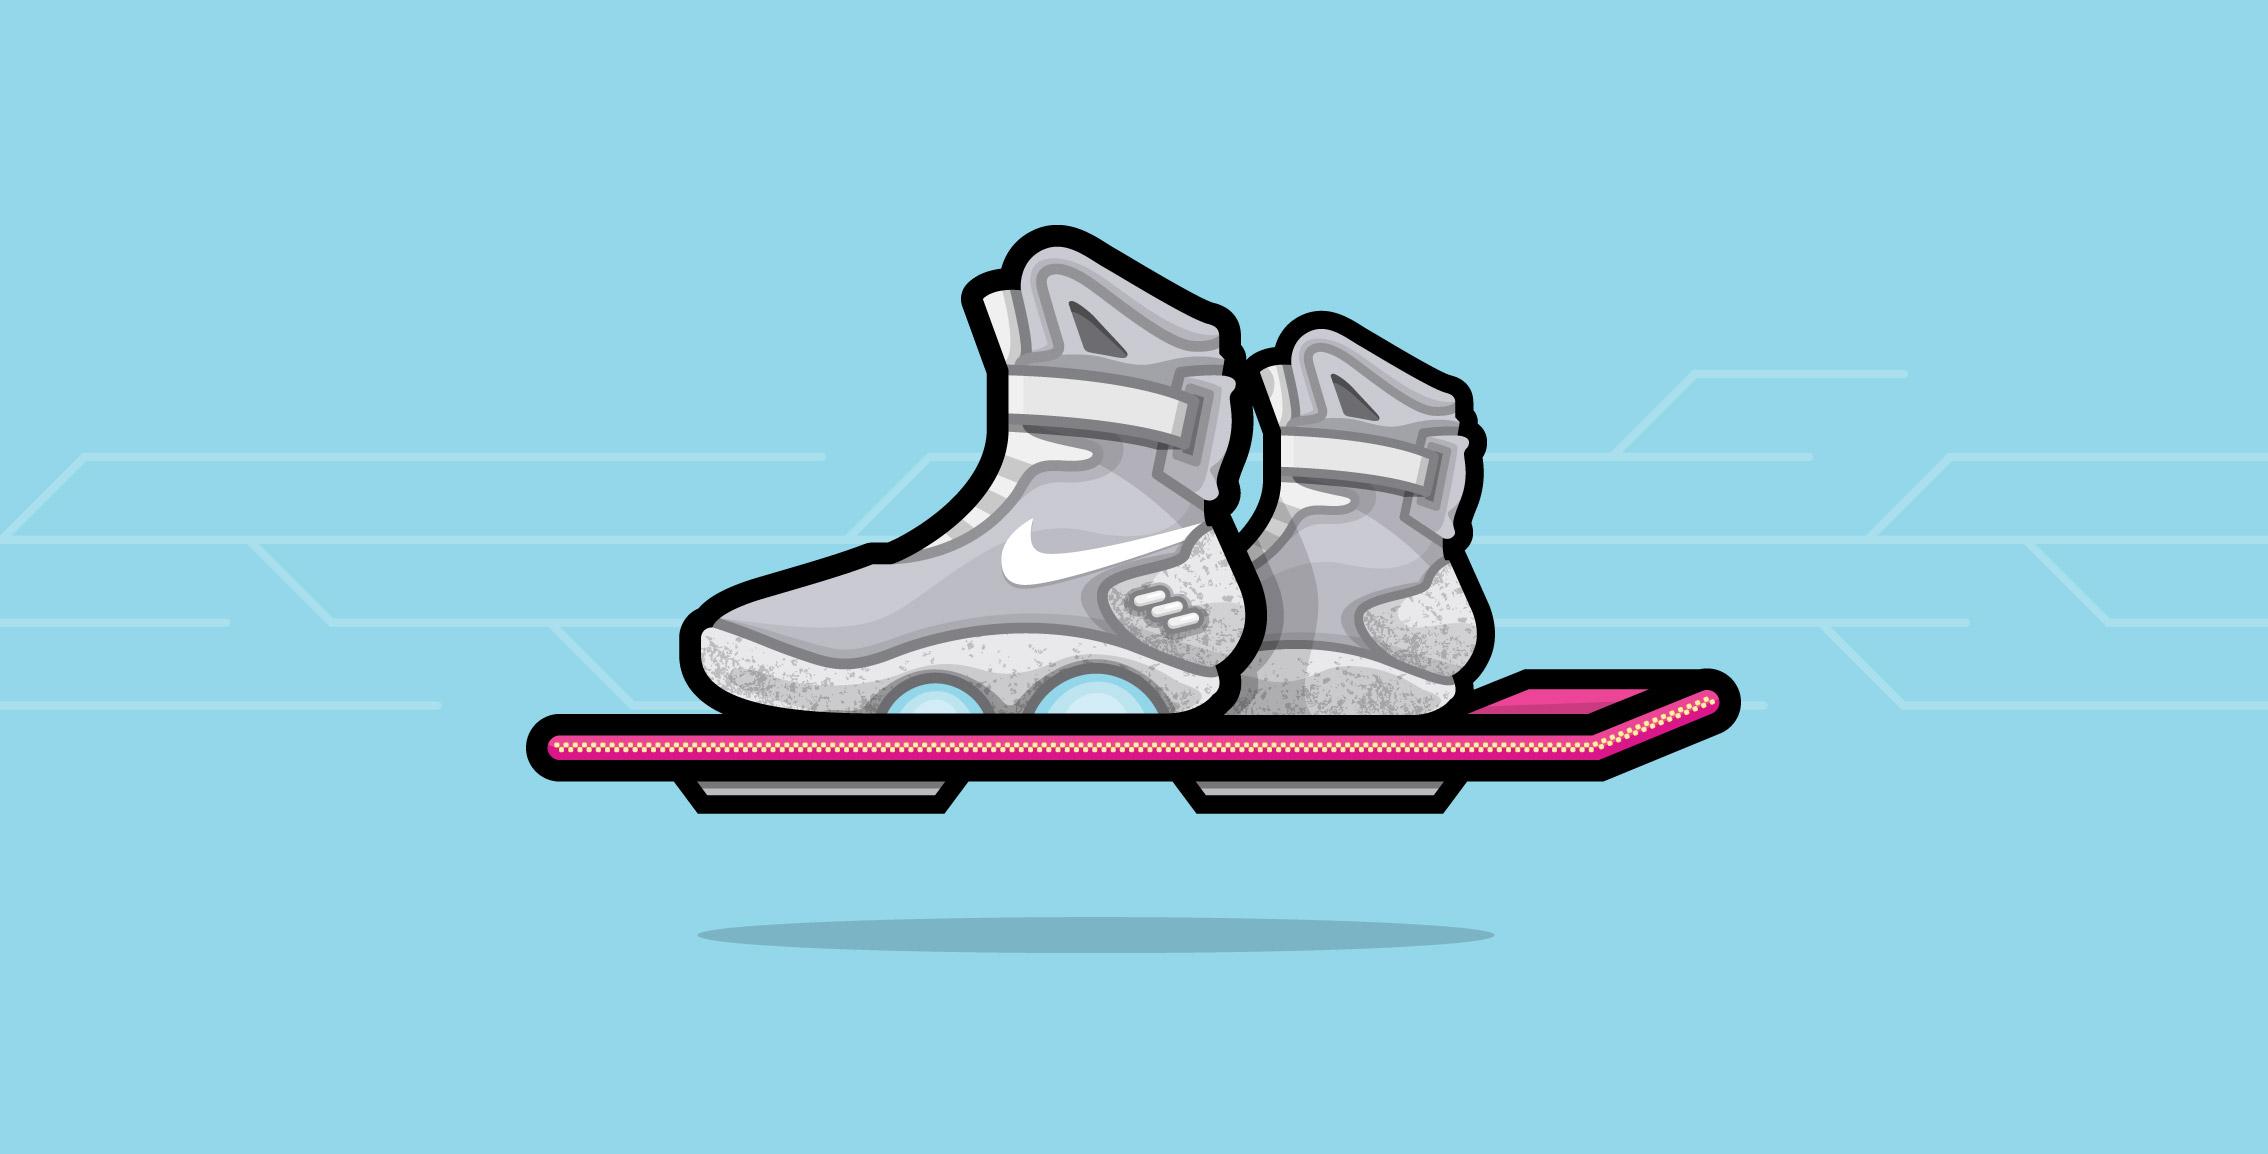 Marty's 2015 Nikes